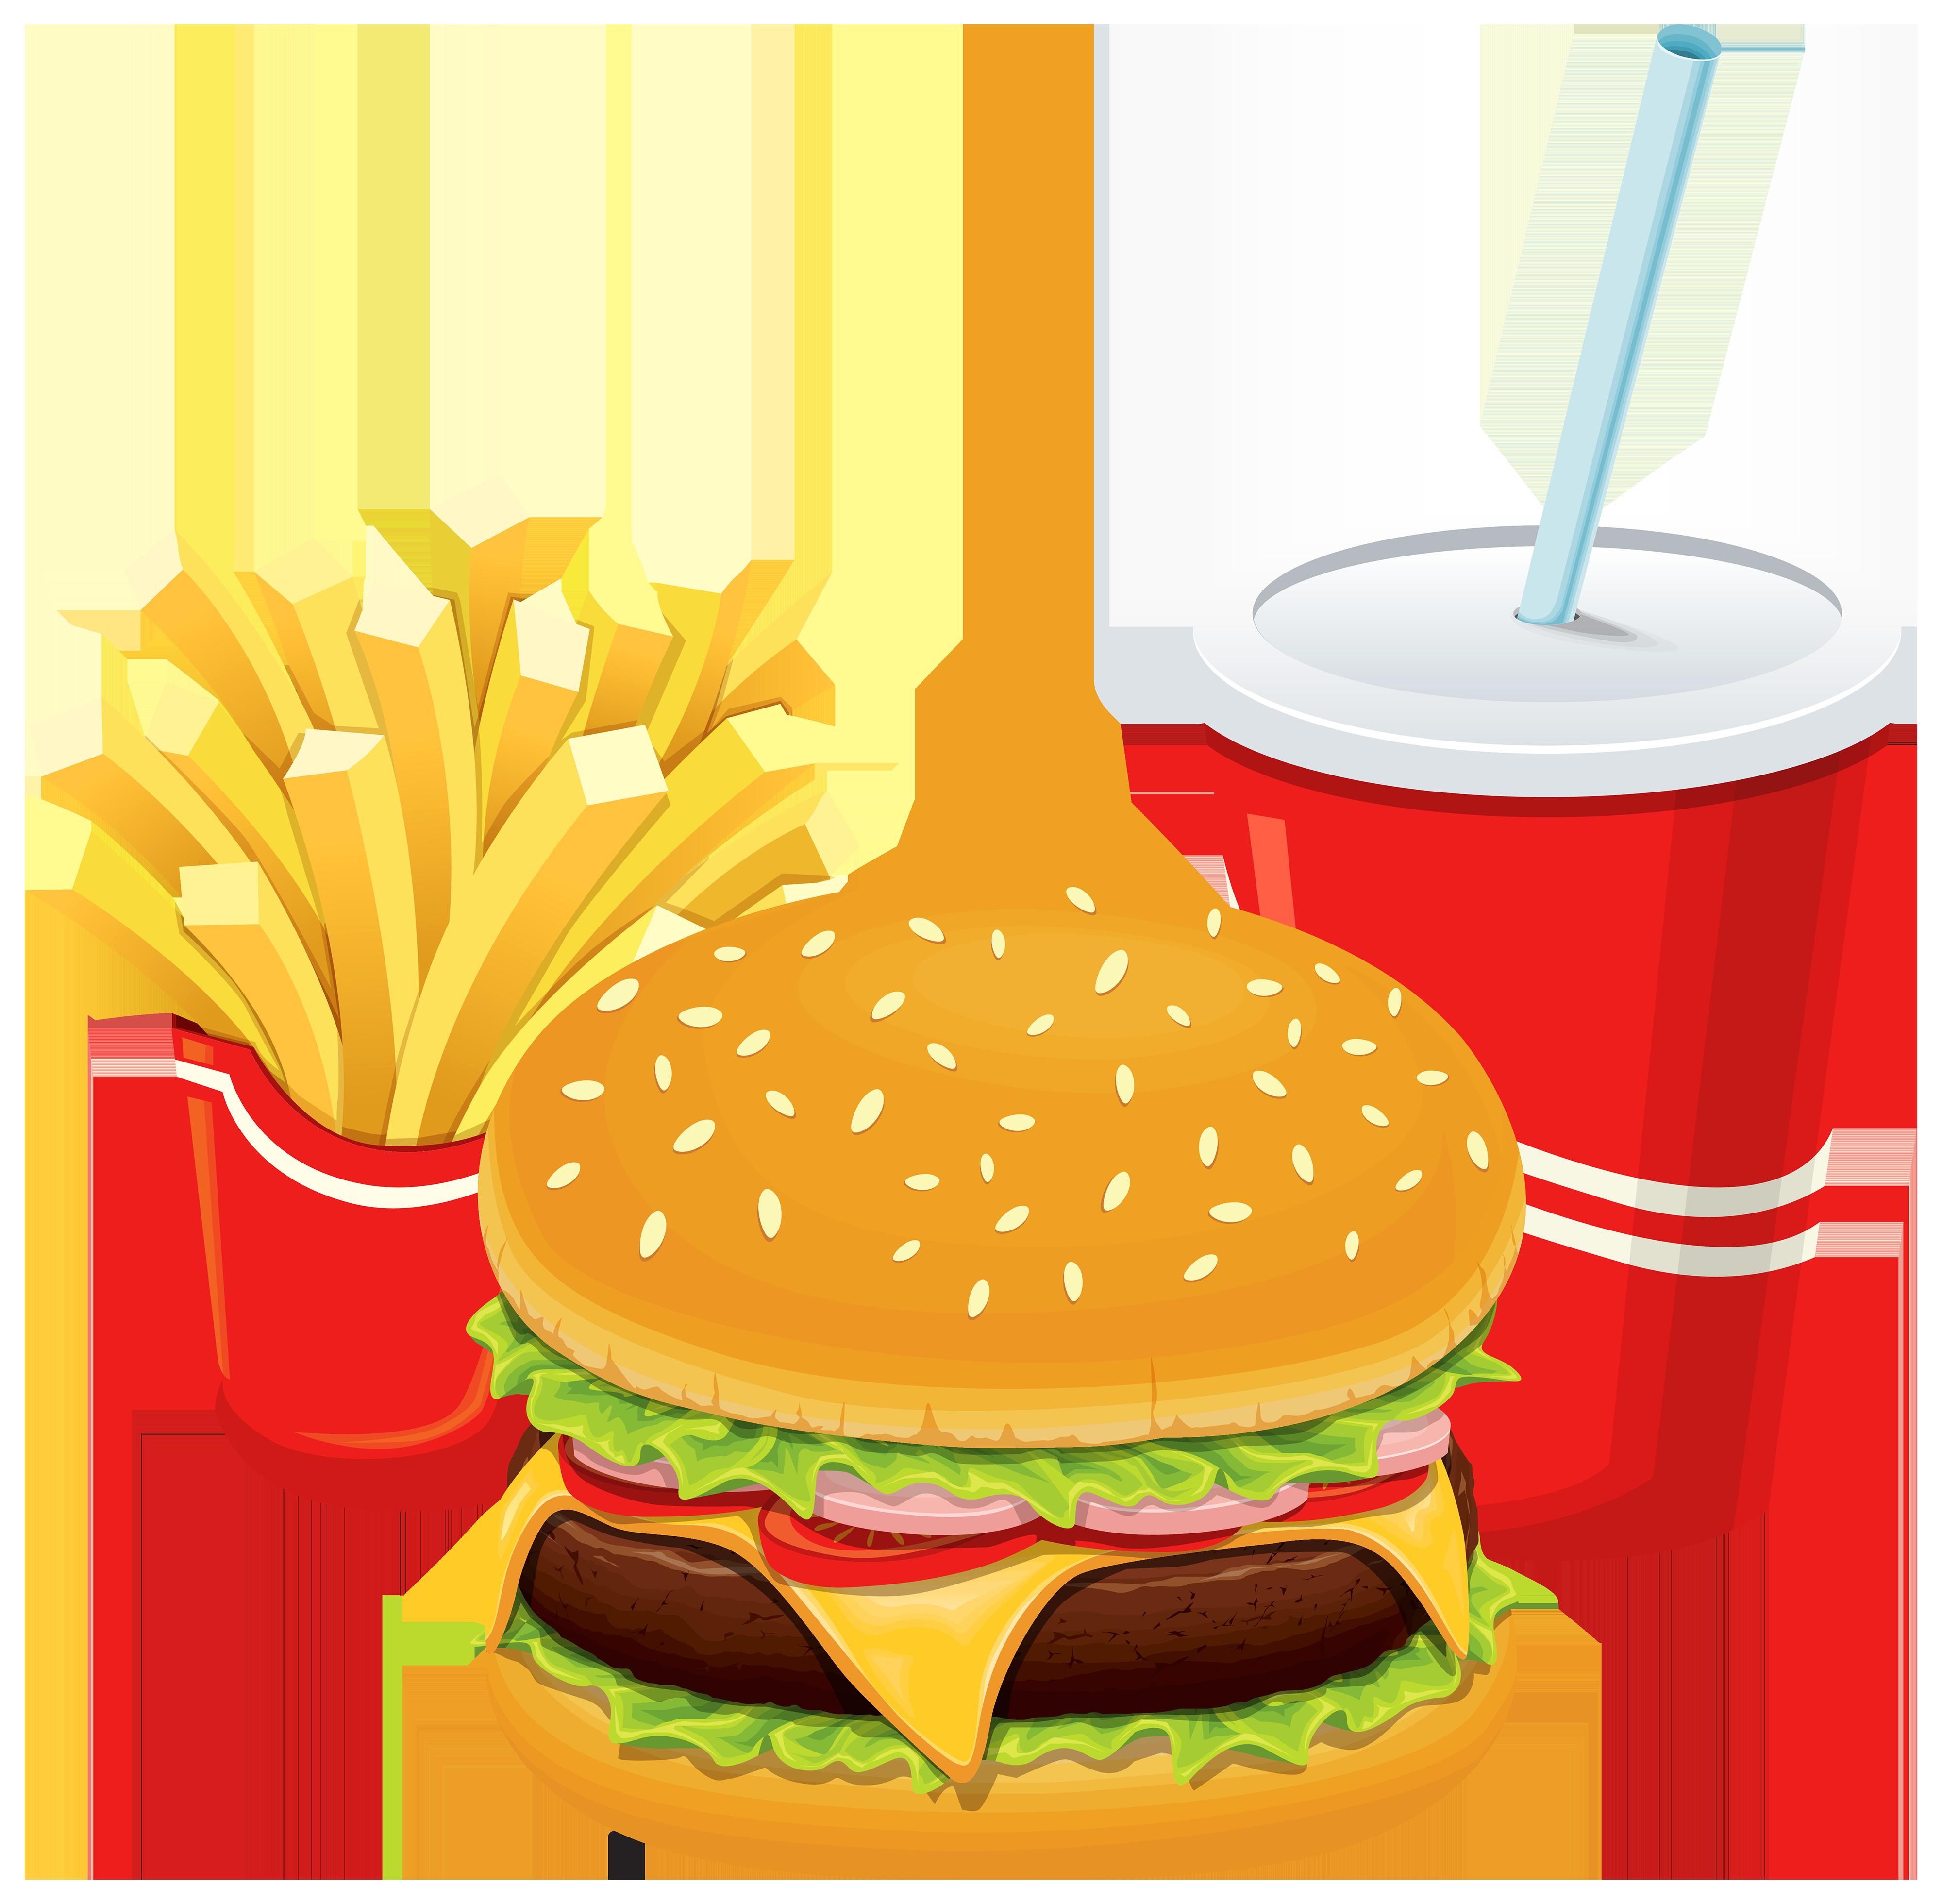 4000x3921 Hamburger Fries And Cola Png Clipart